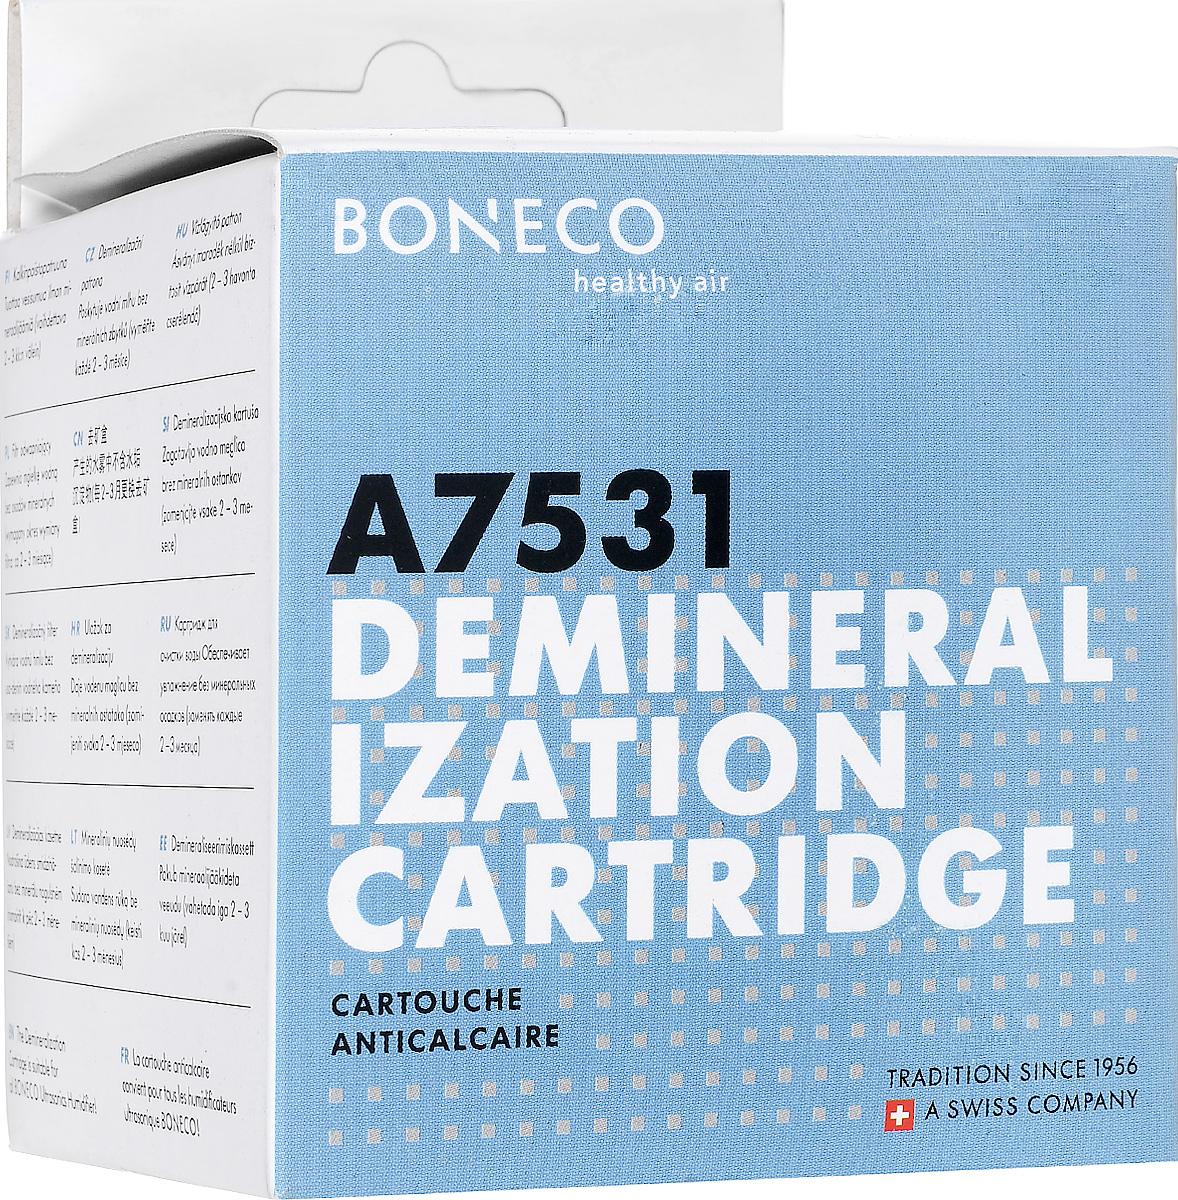 Boneco 7531 фильтр-картридж AG+